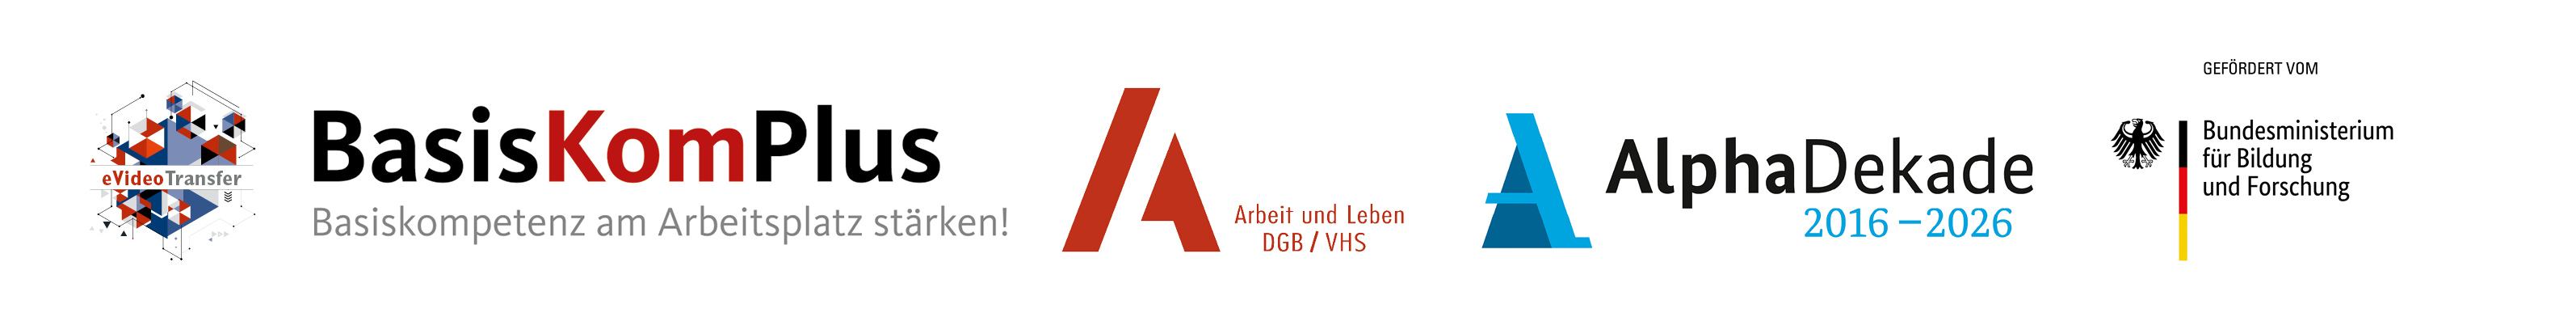 Logoleiste: eVideo, BasisKomPlus, Arbeit und Leben, Alpha-Dekade, BMBS